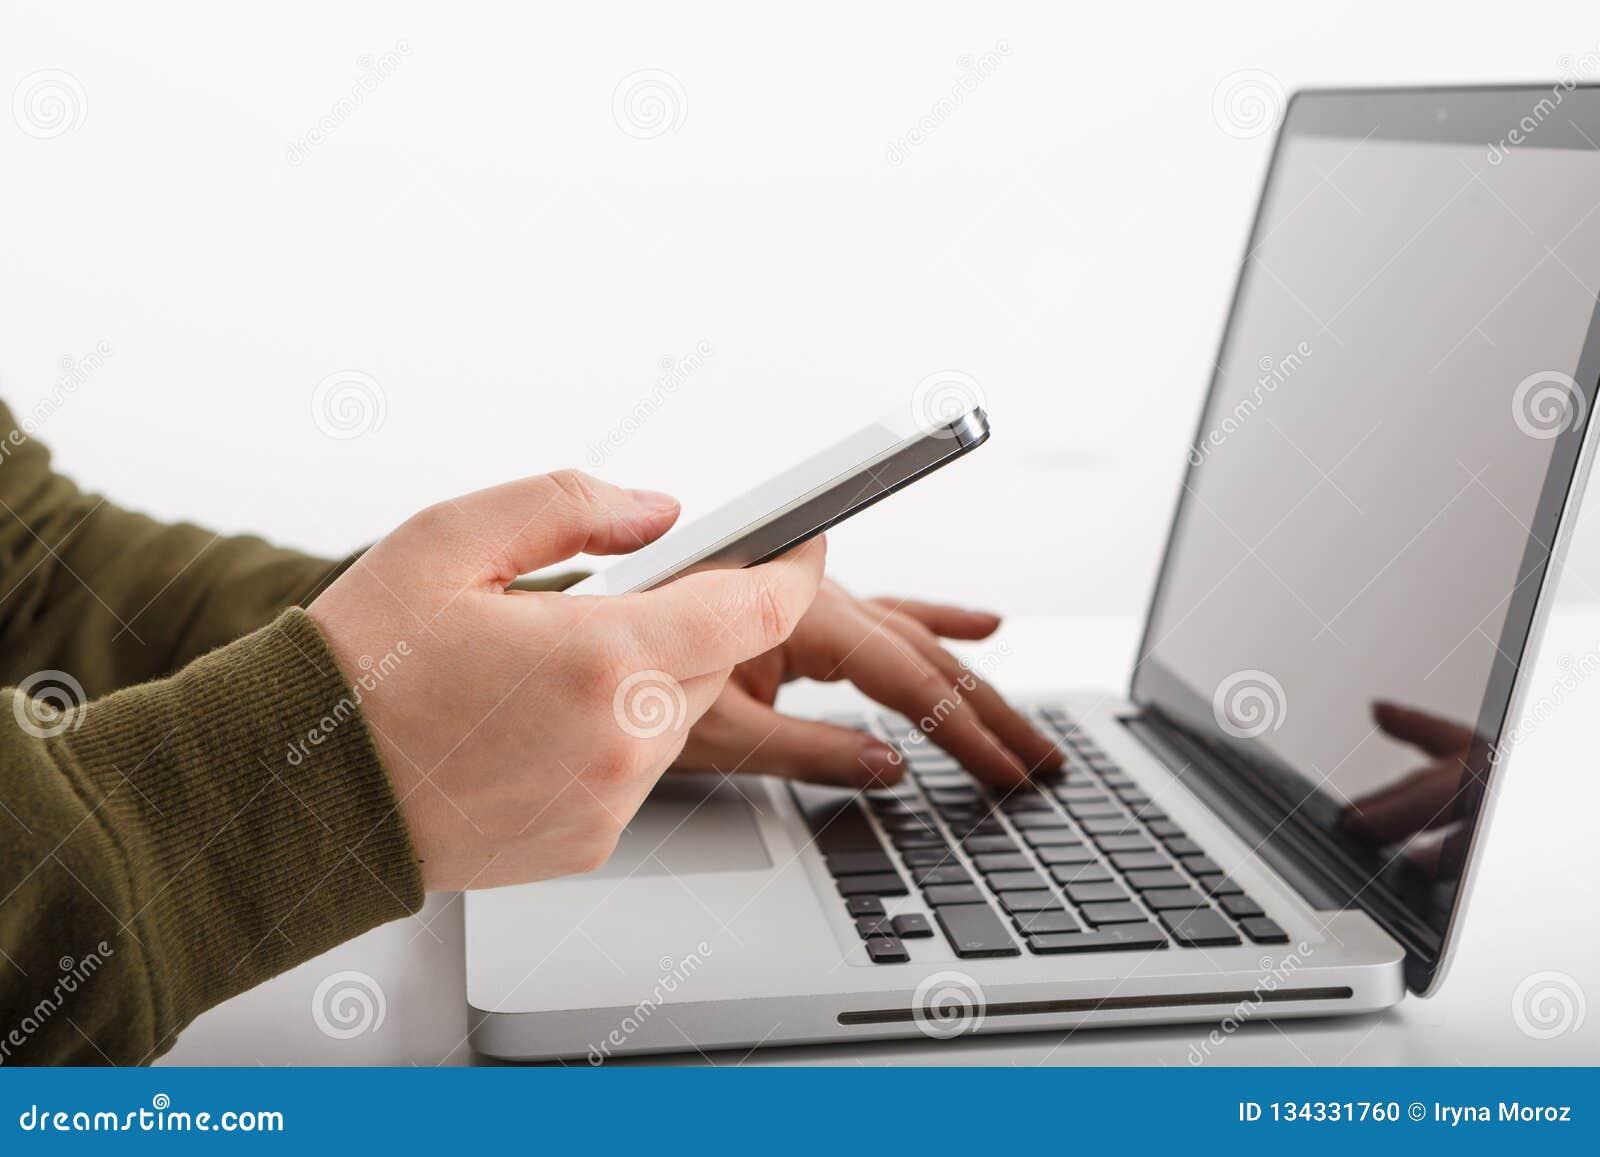 Man& x27;s hands using smartphone in interior